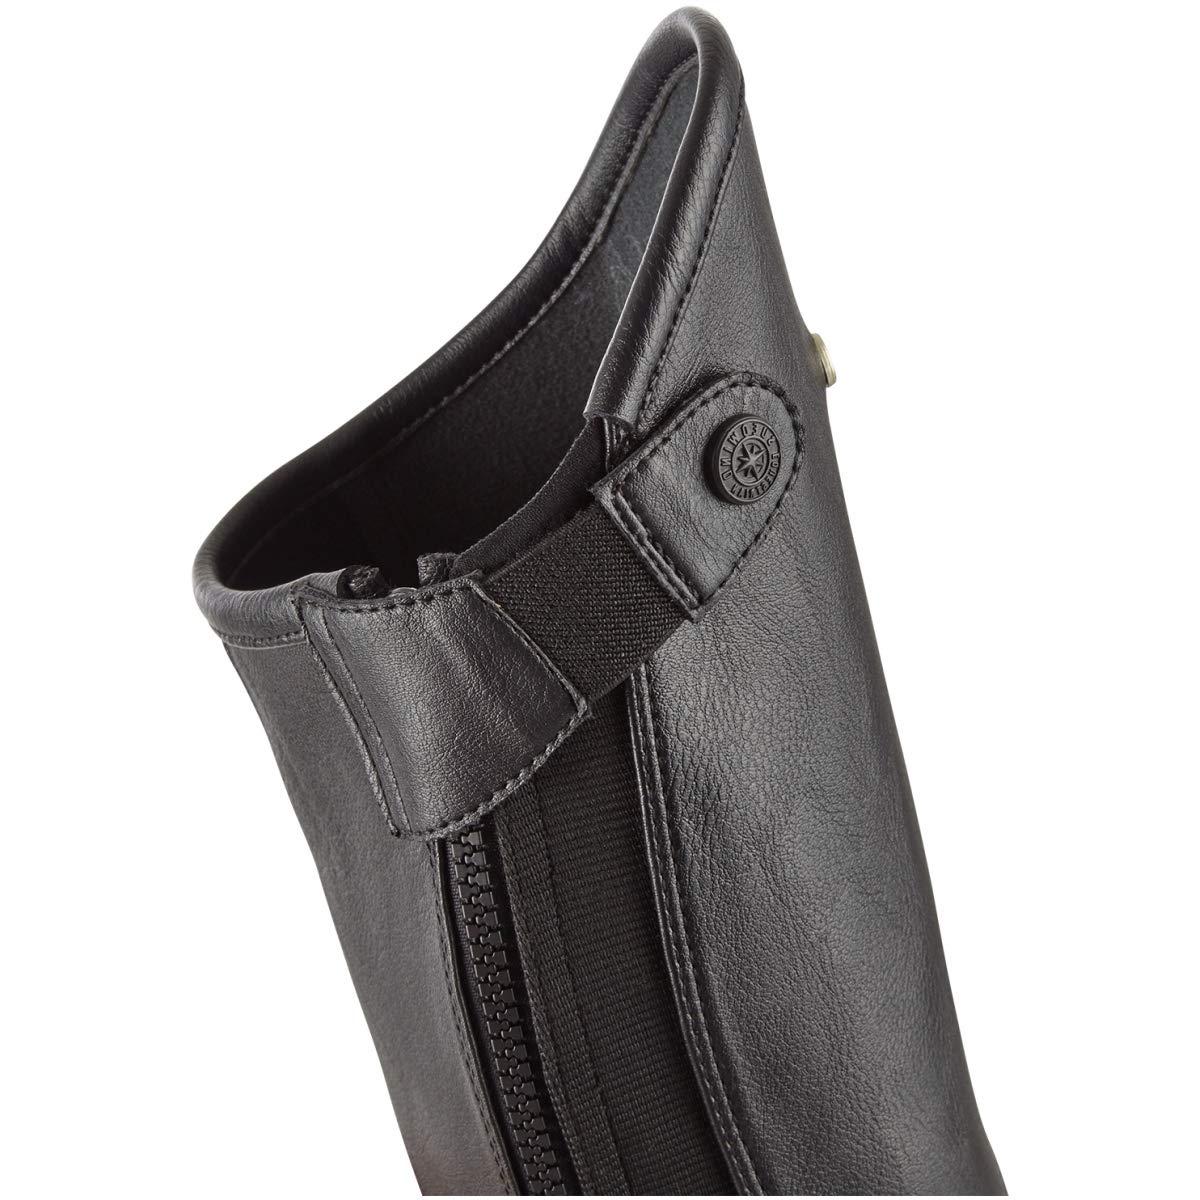 SUEDWIND Minichaps Minichaps Minichaps Leder Comfort Soft schwarz 96c088